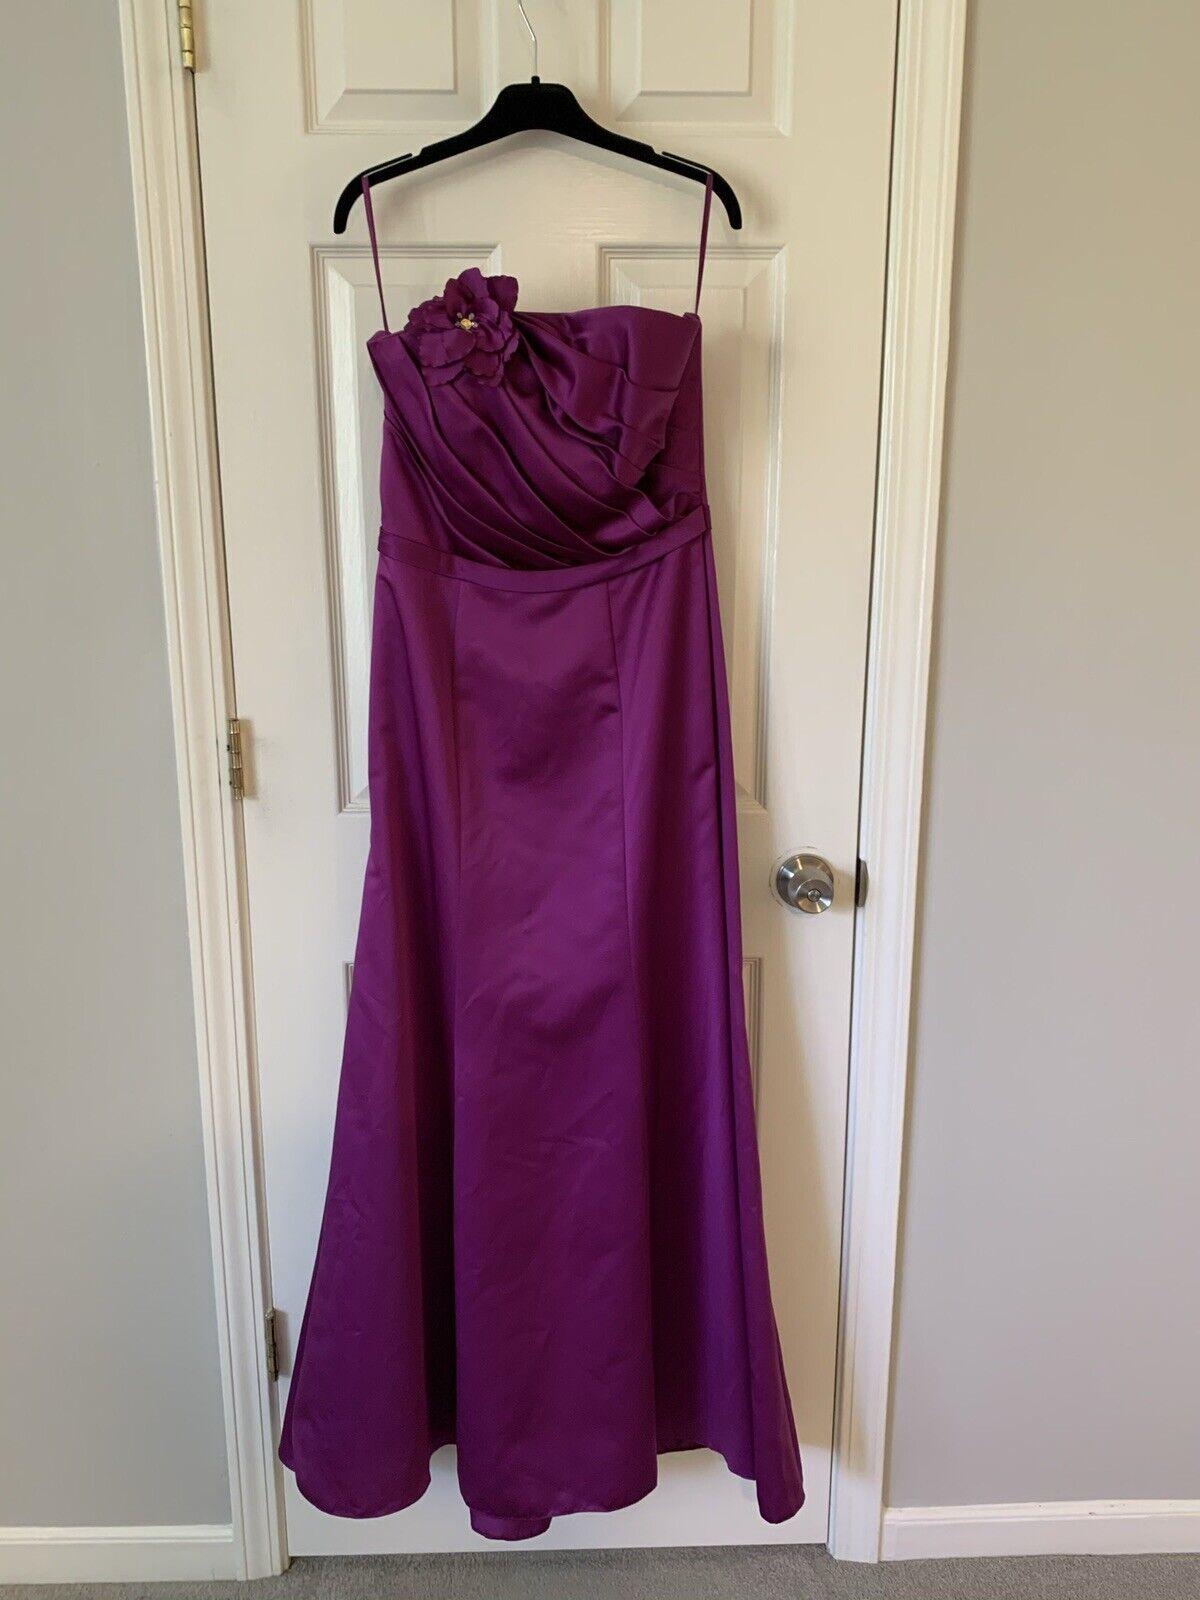 Bridesmaid Evening Long Dress (Impression Bridal Boutique); Never Worn; New